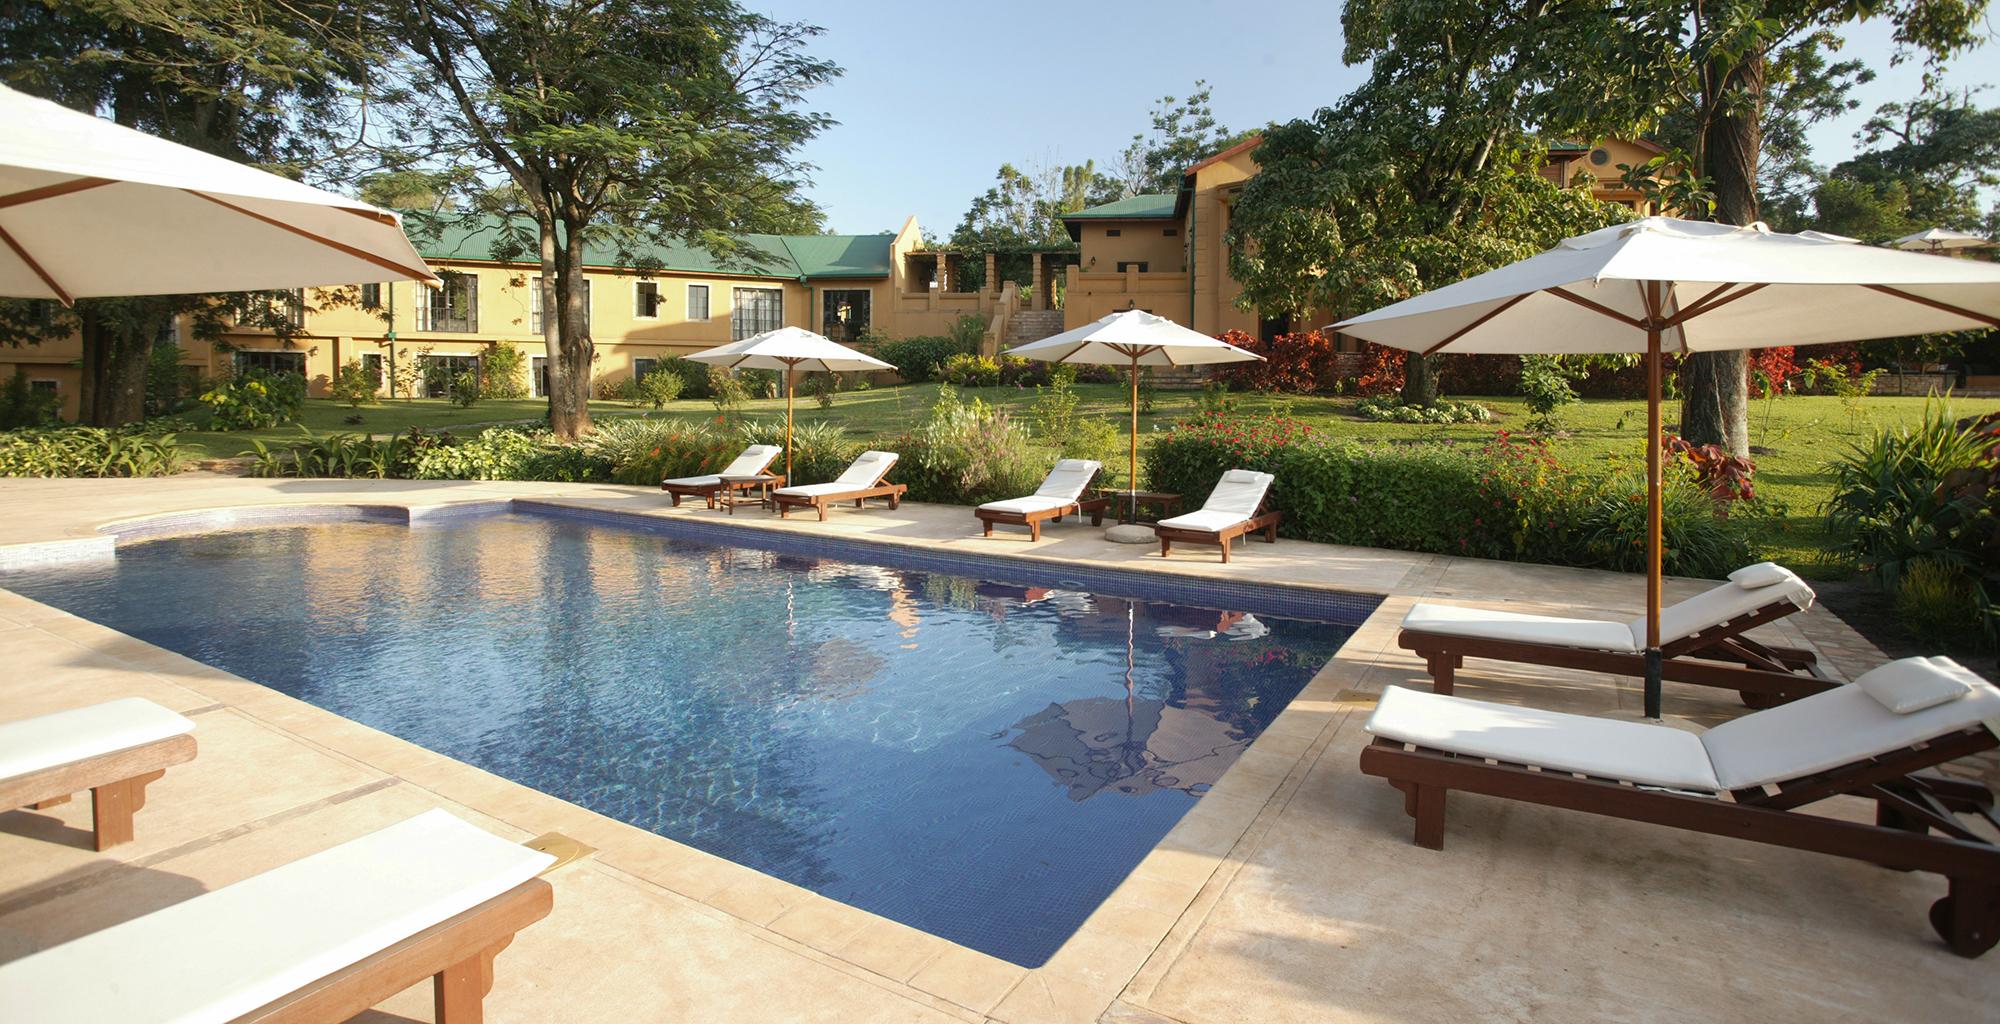 Uganda-Emin-Pasha-Pool